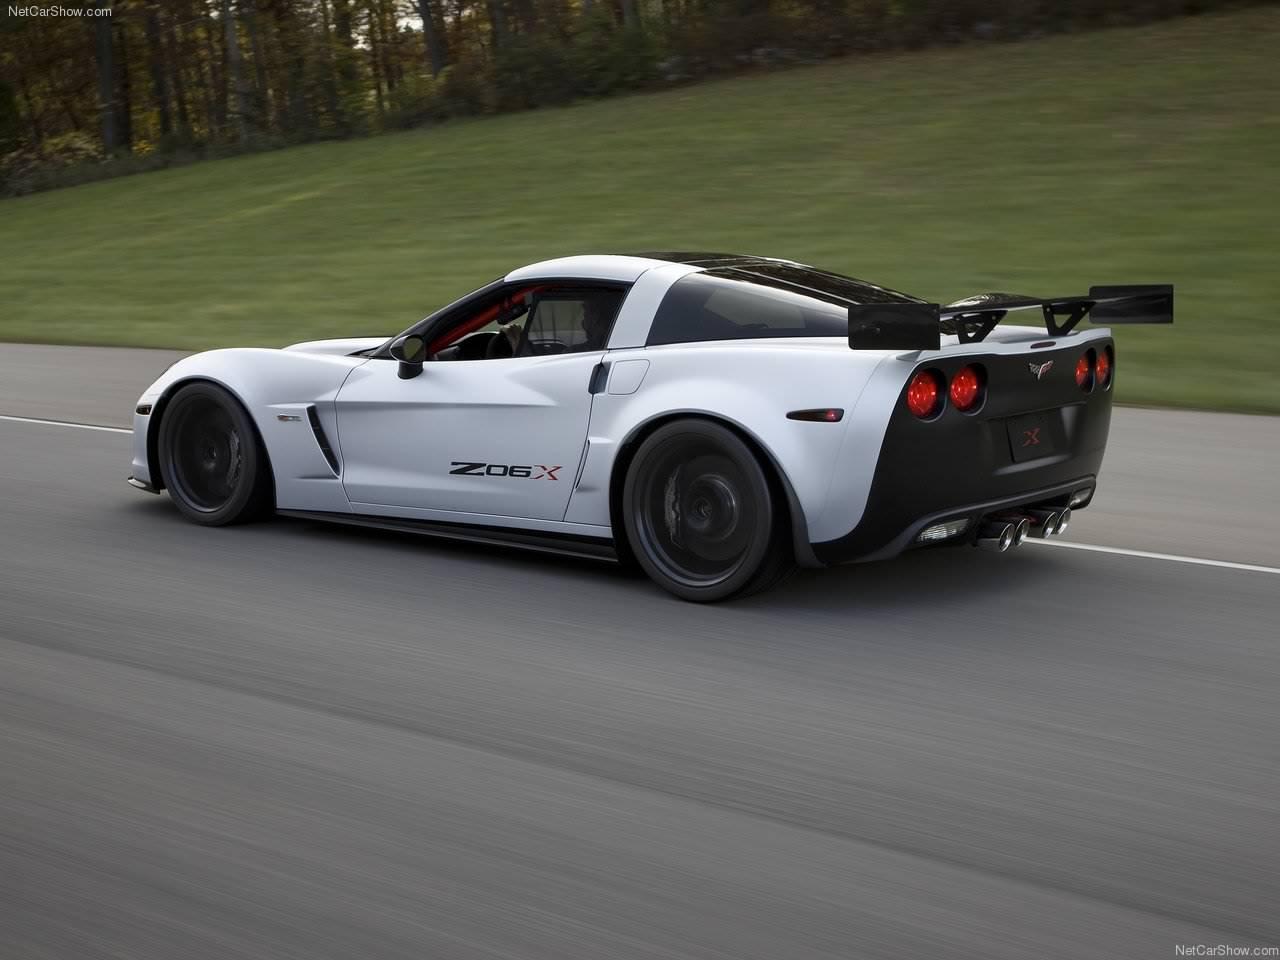 http://3.bp.blogspot.com/_H1gBps8JpiY/TPyy8E-wnVI/AAAAAAAAMGY/nZLYnb2VY5o/s1600/Chevrolet-Corvette_Z06X_Concept_2010_1280x960_wallpaper_03.jpg